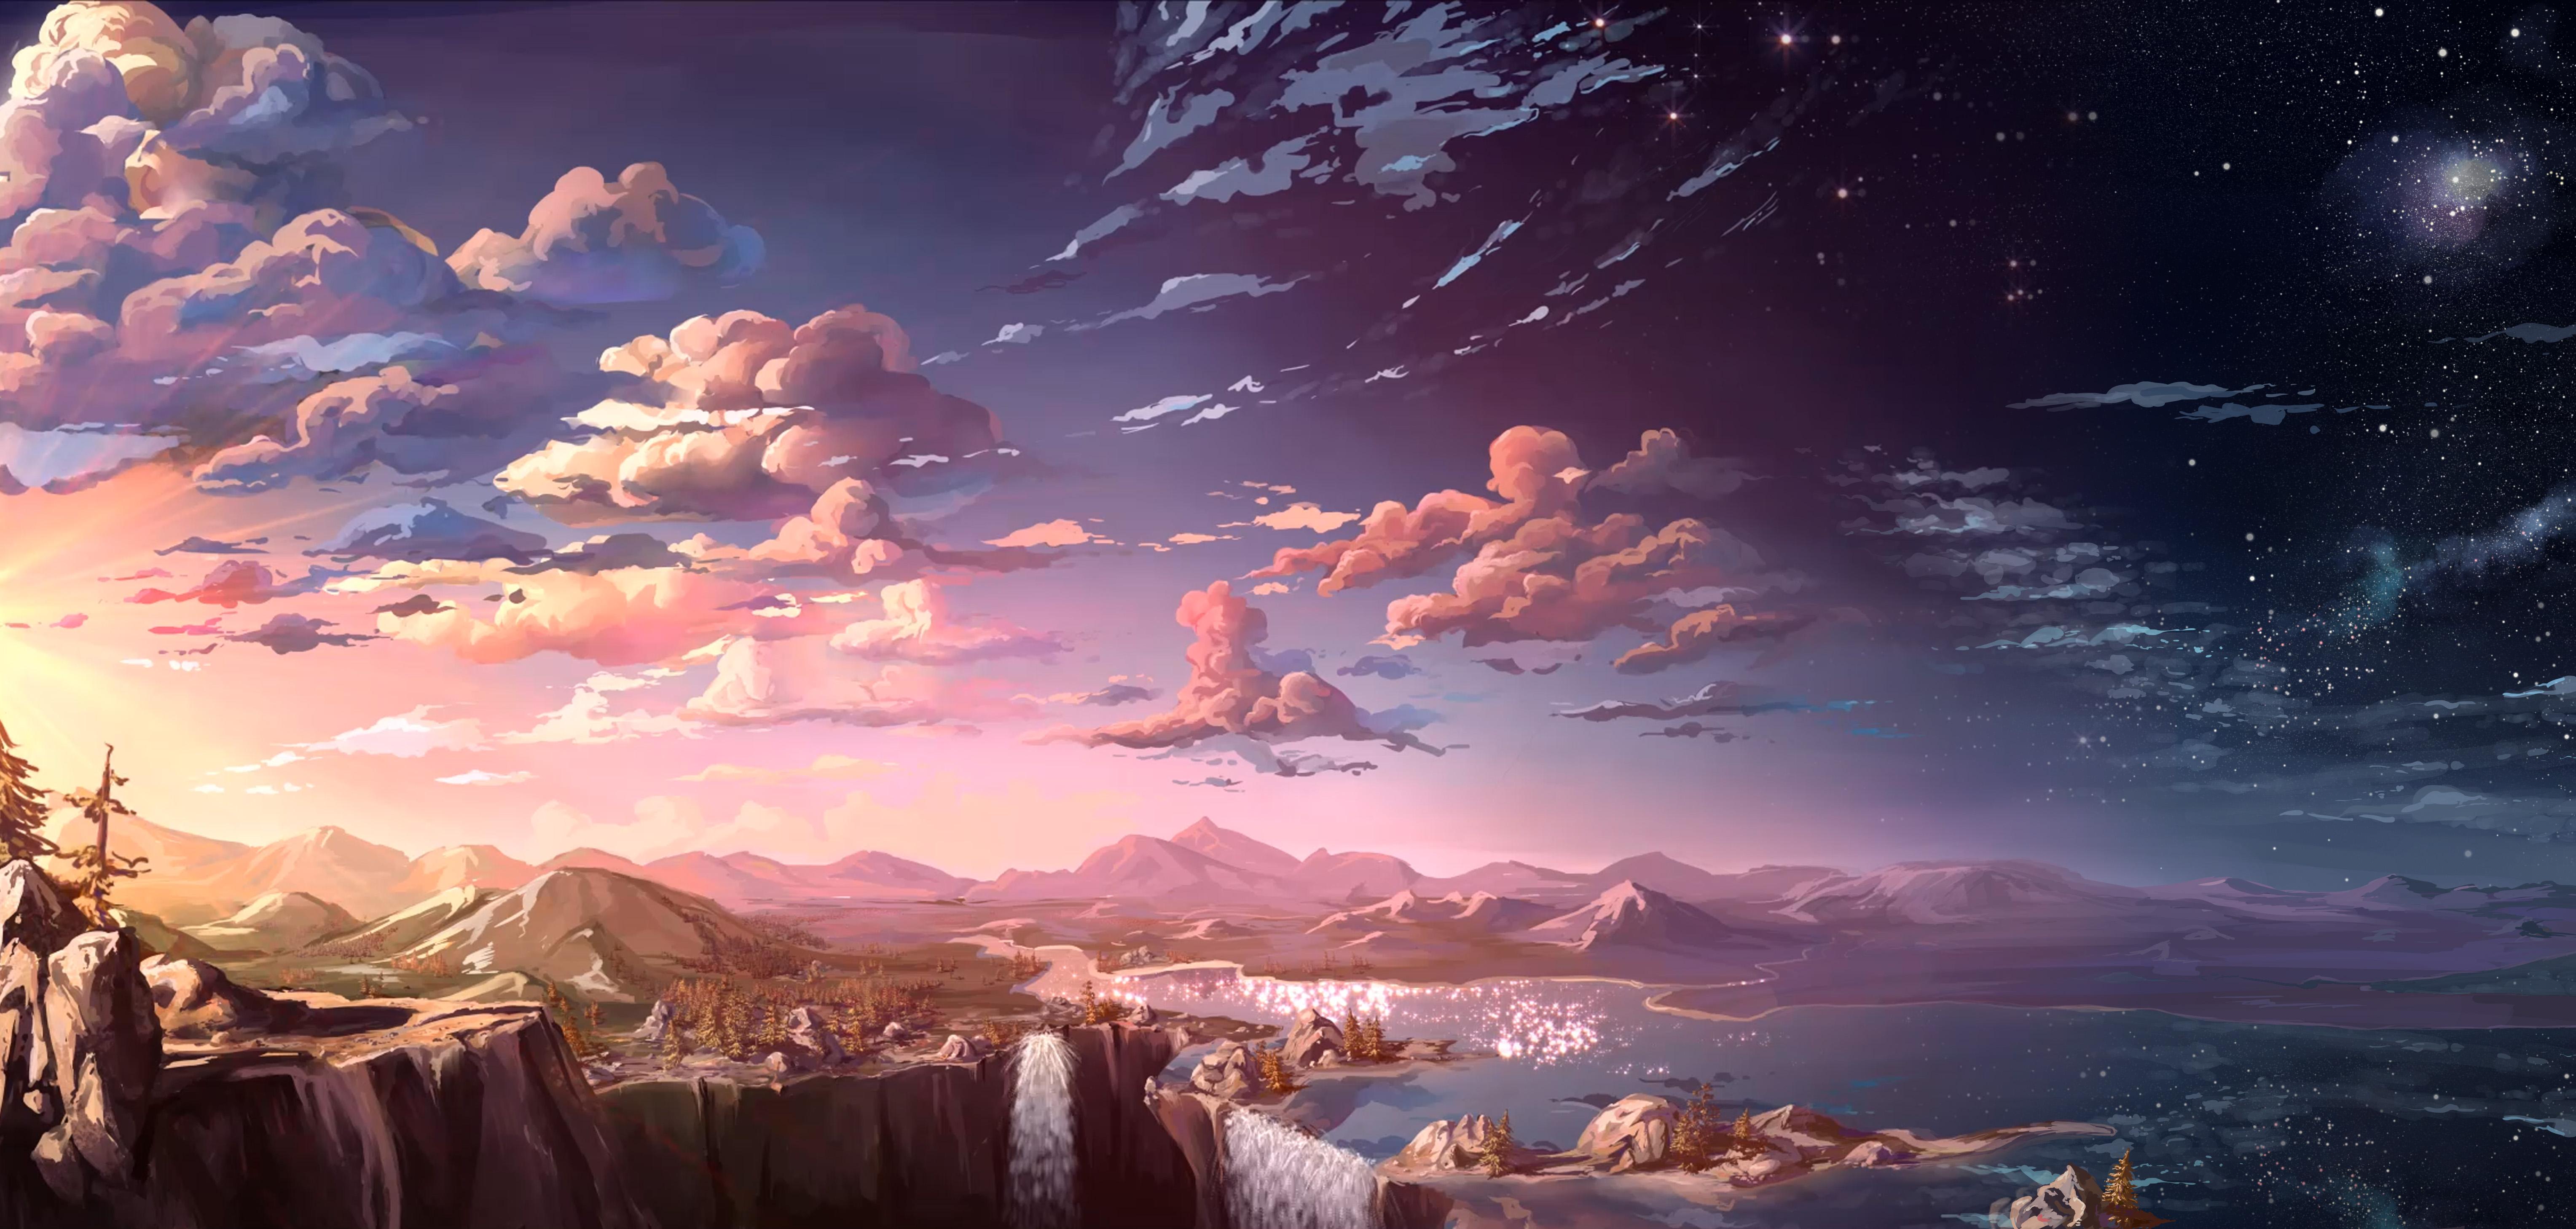 2048x2048 Serene Sunset Ipad Air Hd 4k Wallpapers Images: 2048x2048 Waterfall Sunset Landscape Artist Ipad Air HD 4k